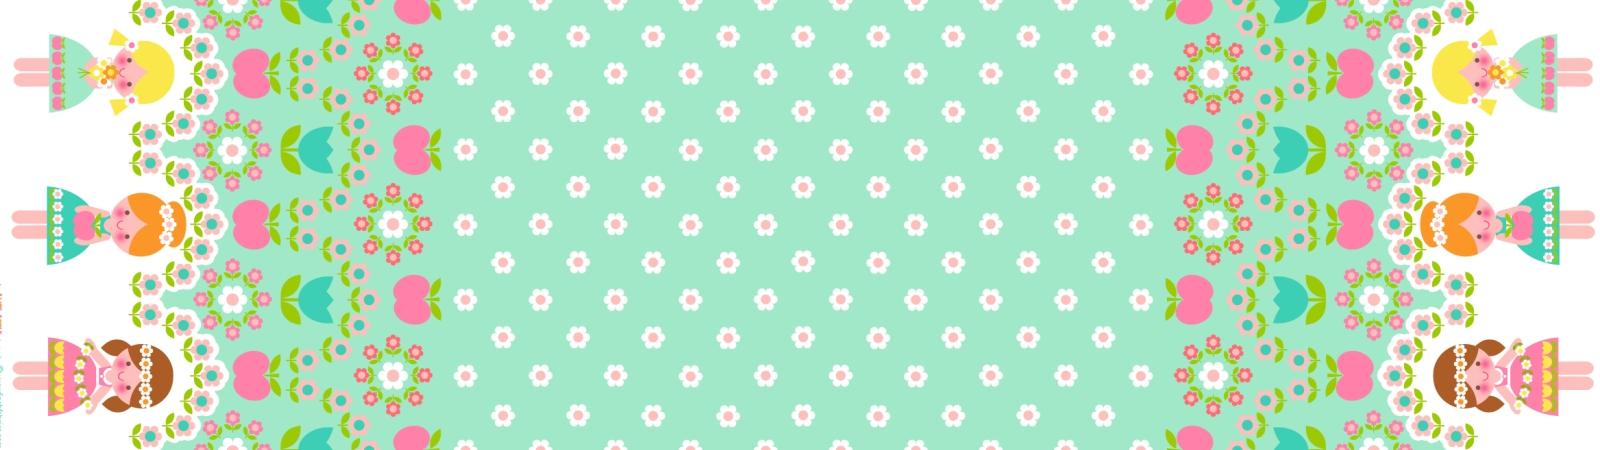 online stoffen groothandel wholesale fabric banner-1600x450